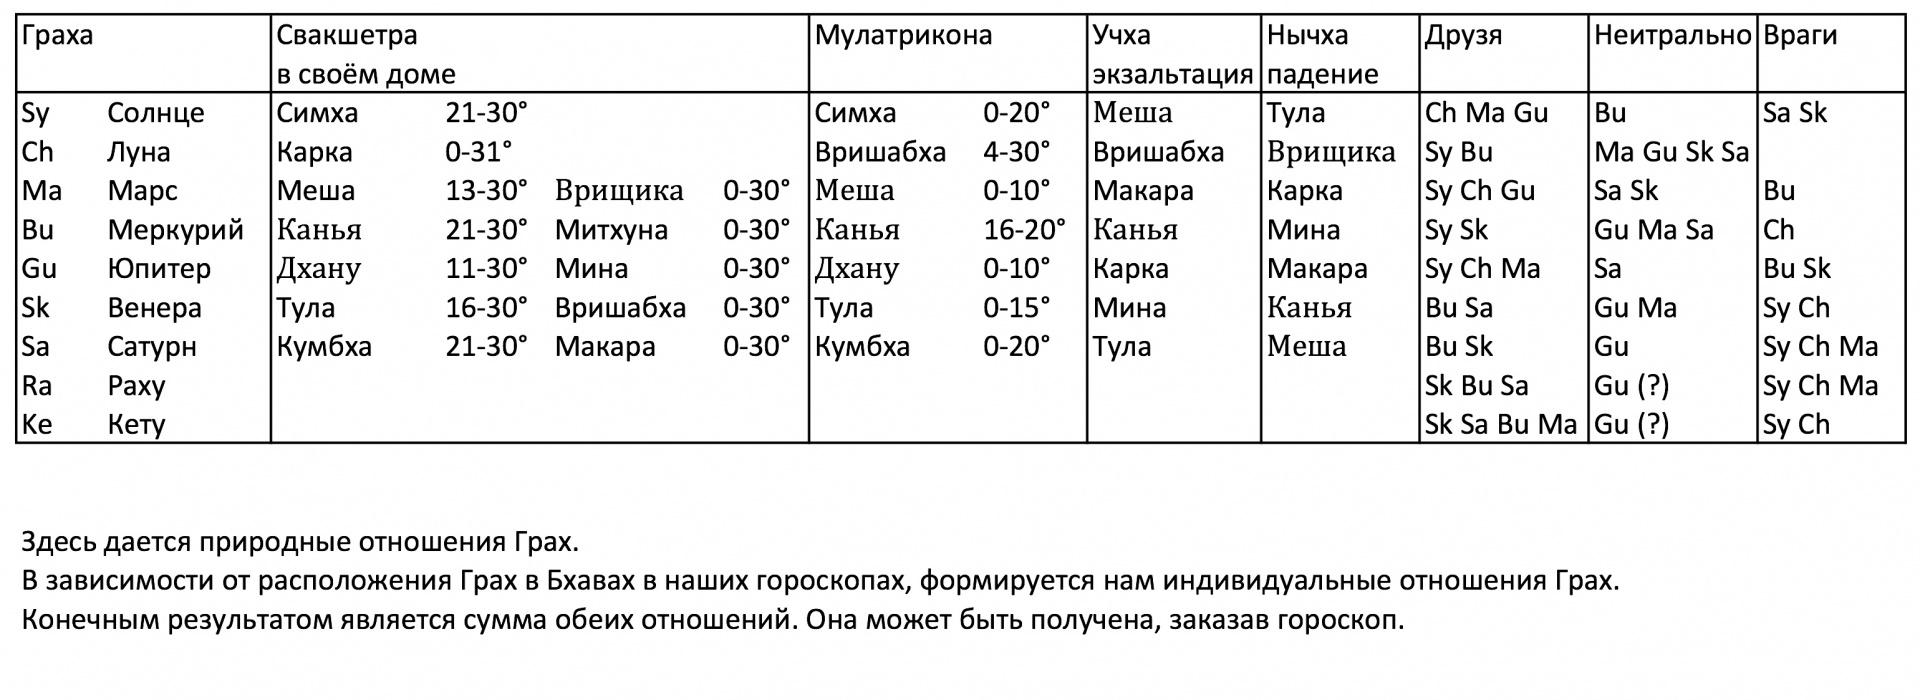 Grahas pdf RU Sheet1 jpg.jpg